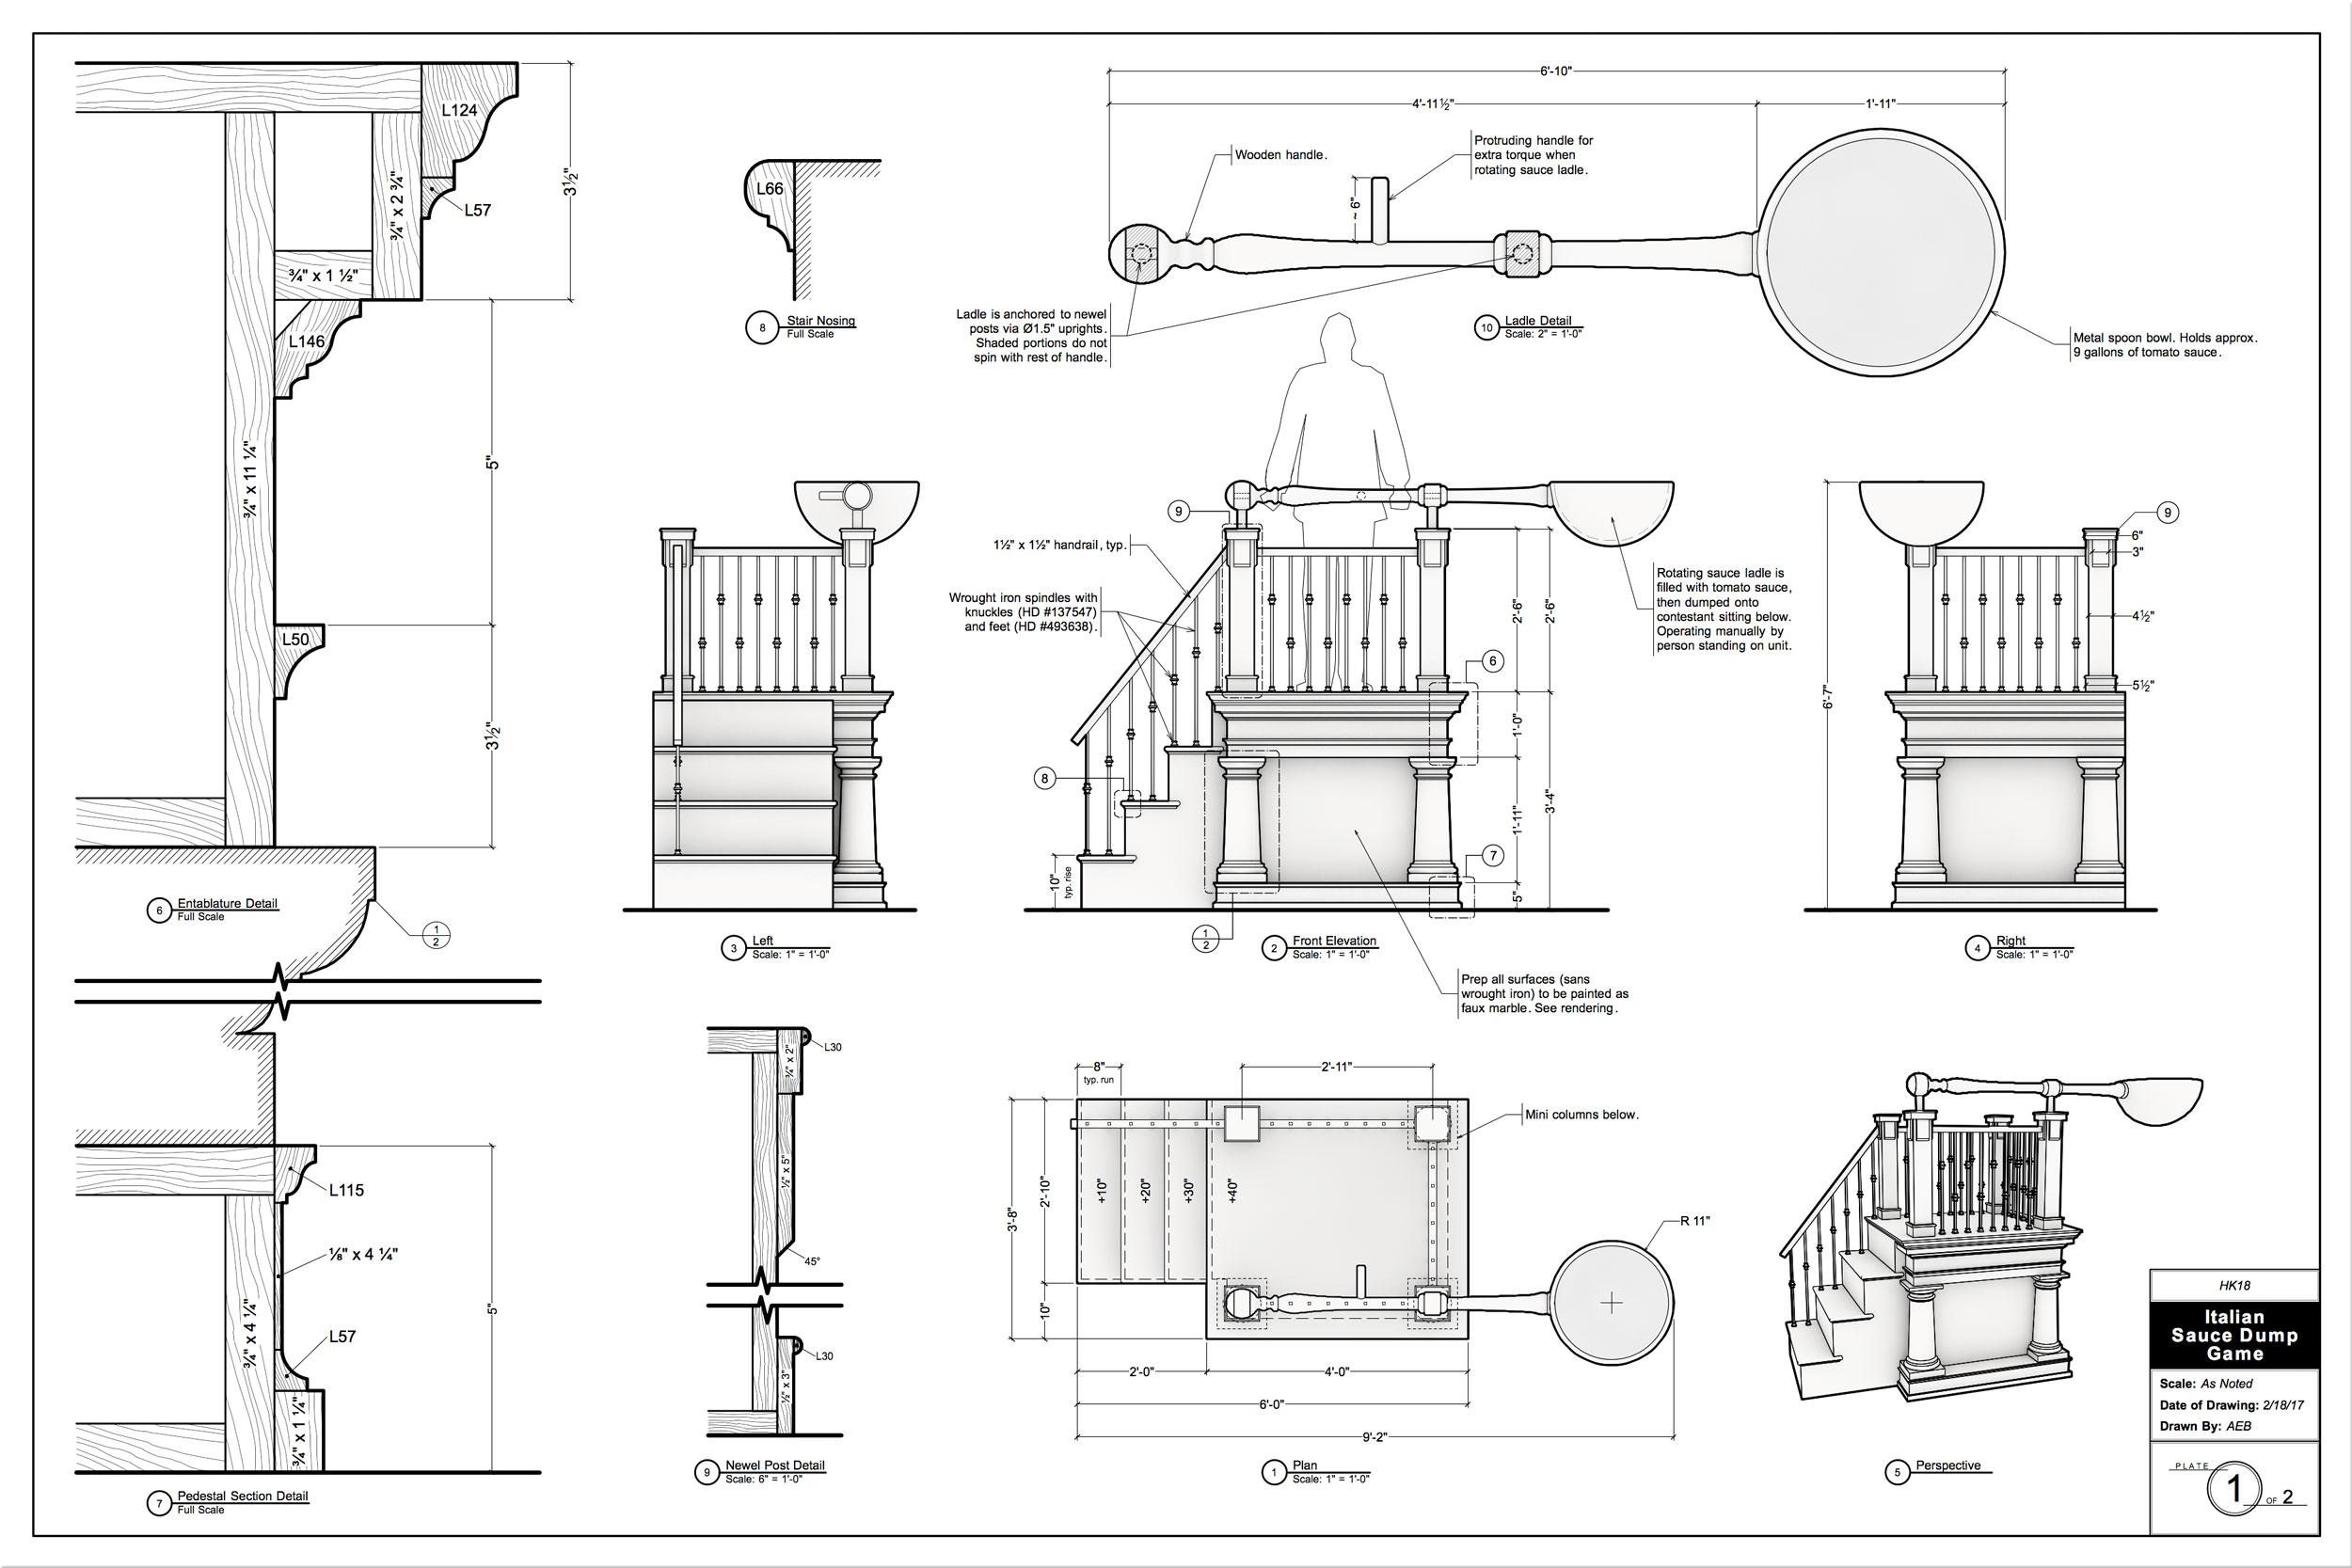 andy-broomell-set-design-drafting-hk-italian-details-art-director.jpg